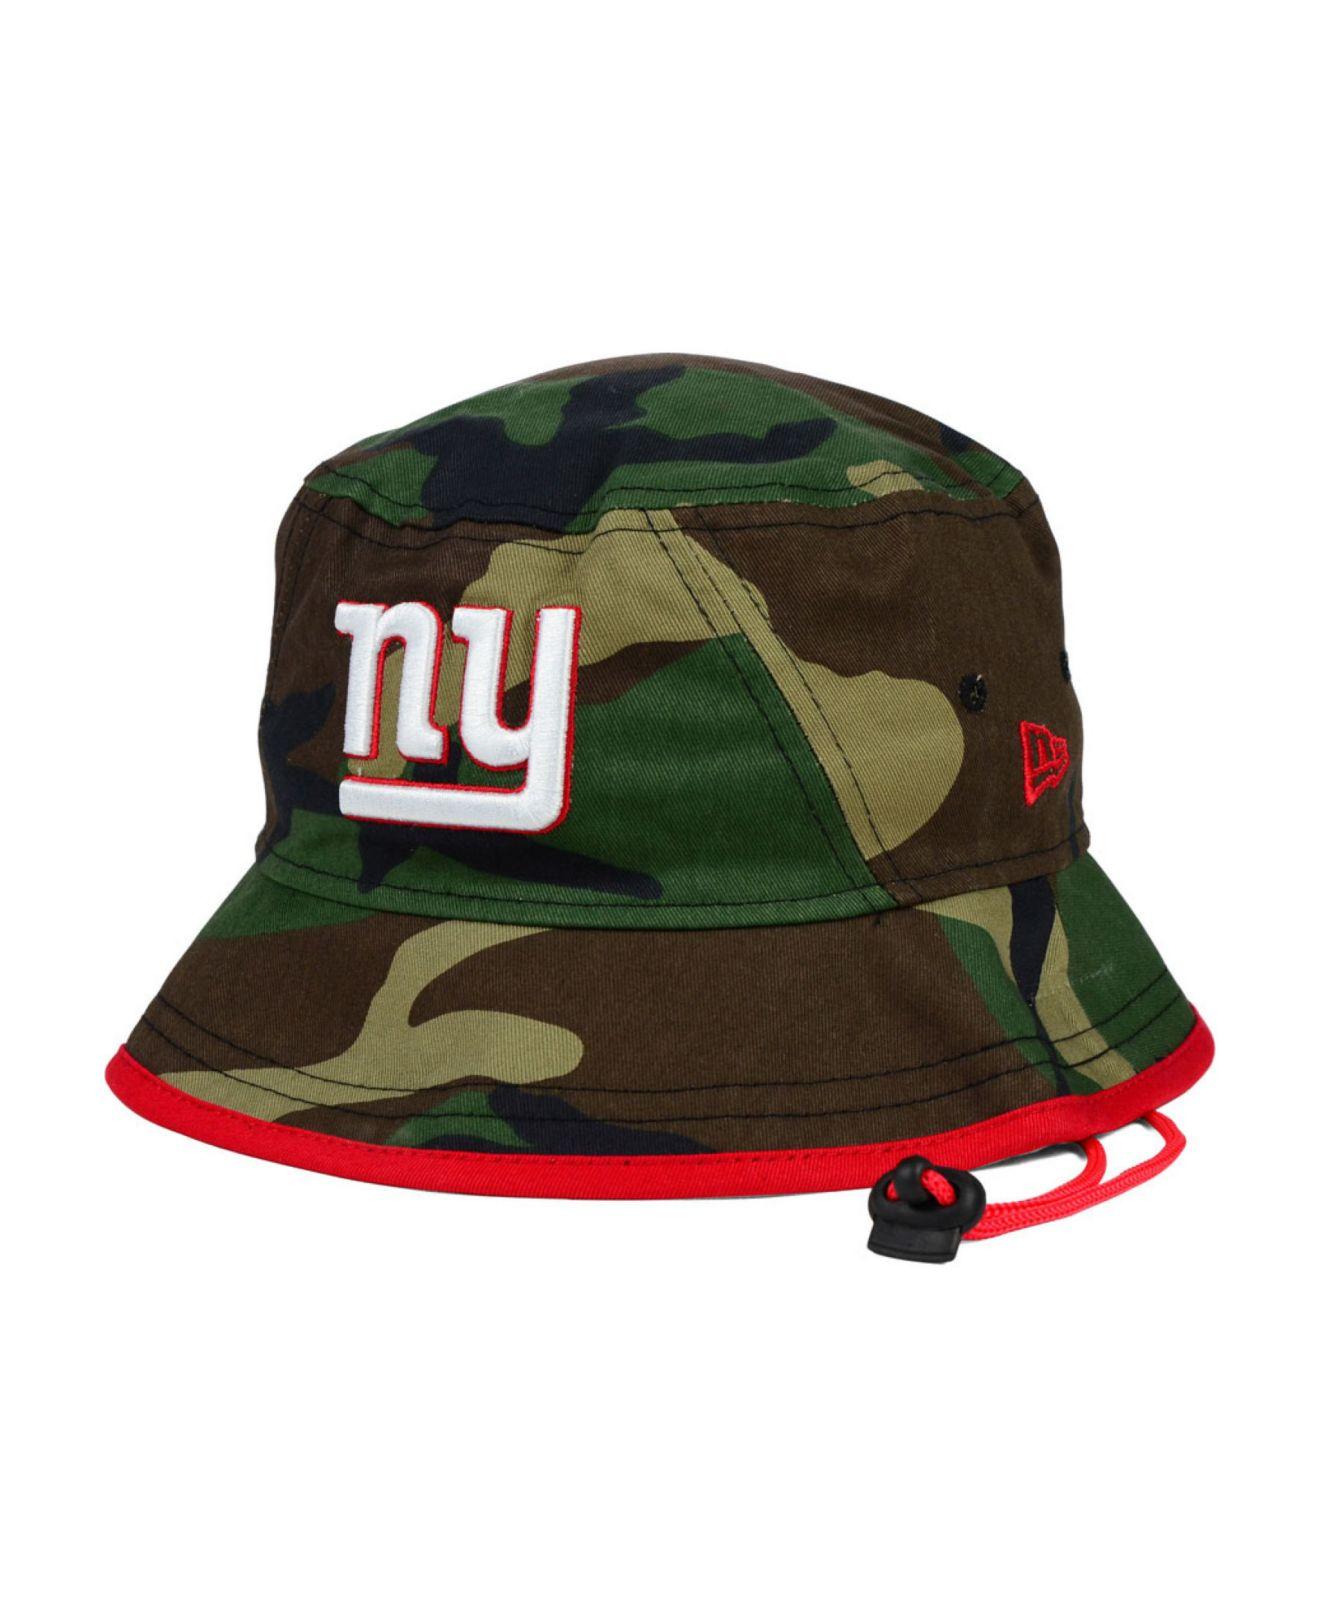 half off 680f3 73b2b ... get lyst ktz new york giants camo pop bucket hat in green for men 8ce62  c238e